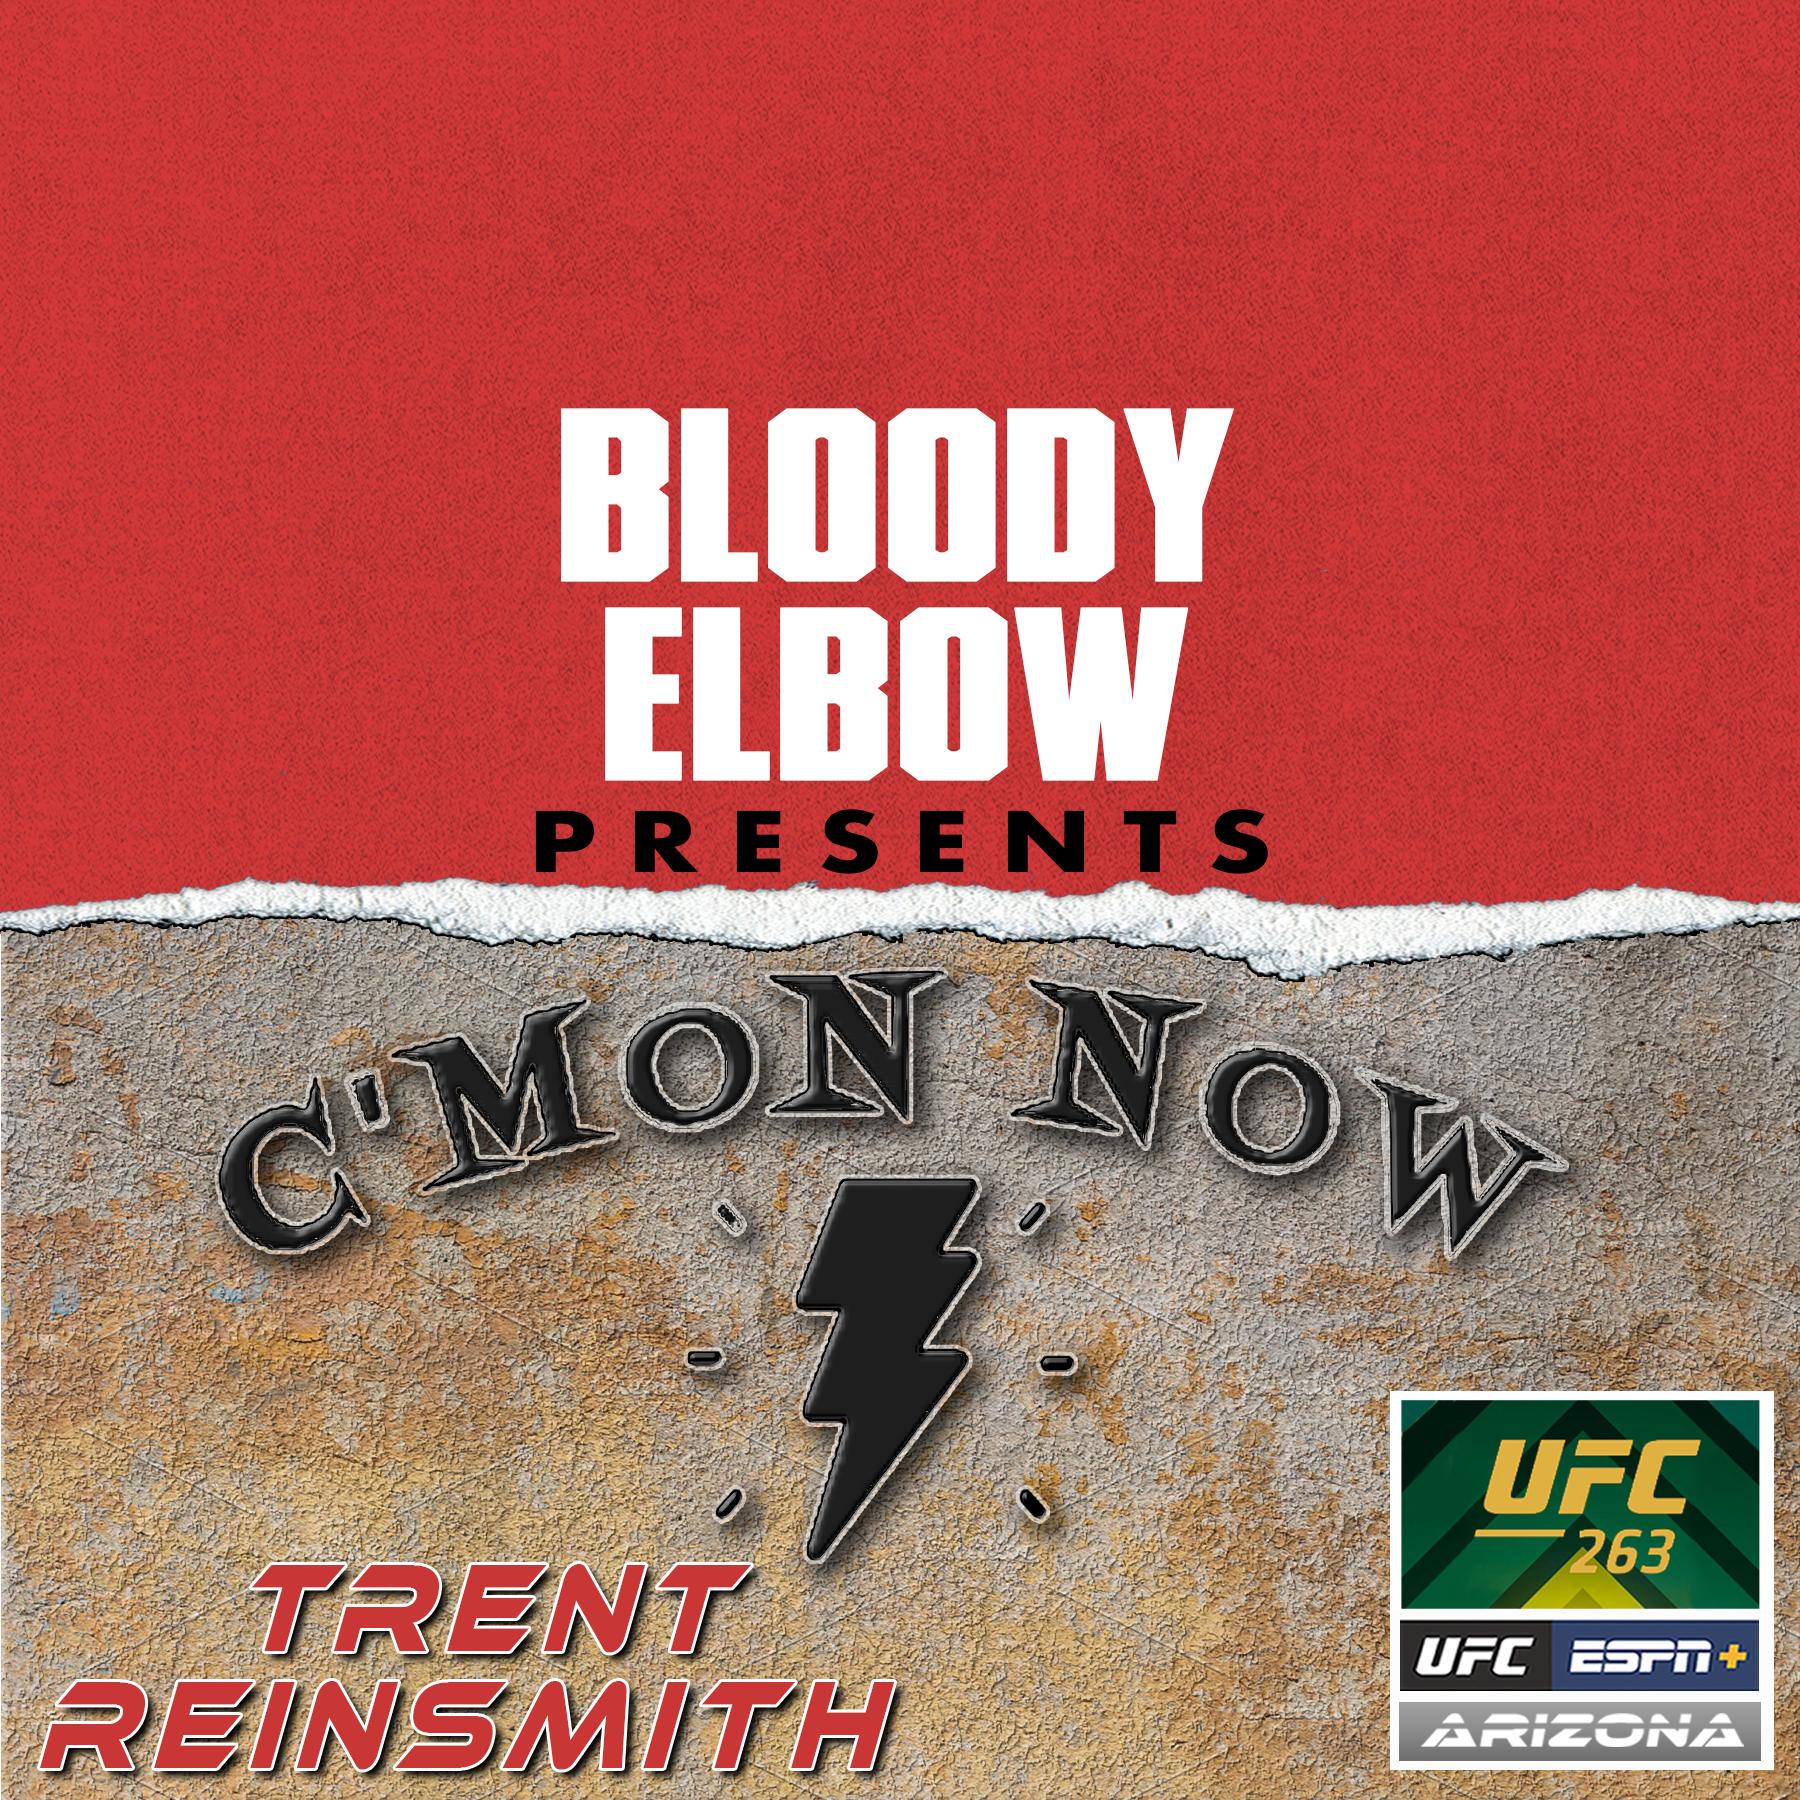 UFC Podcast, UFC 263, C'Mon Now MMA Podcast, Trent Reinsmith, UFC News, UFC Editorial, Adesanya vs Vettori 2, Figueiredo vs Moreno 2, Edwards vs Nate Diaz,